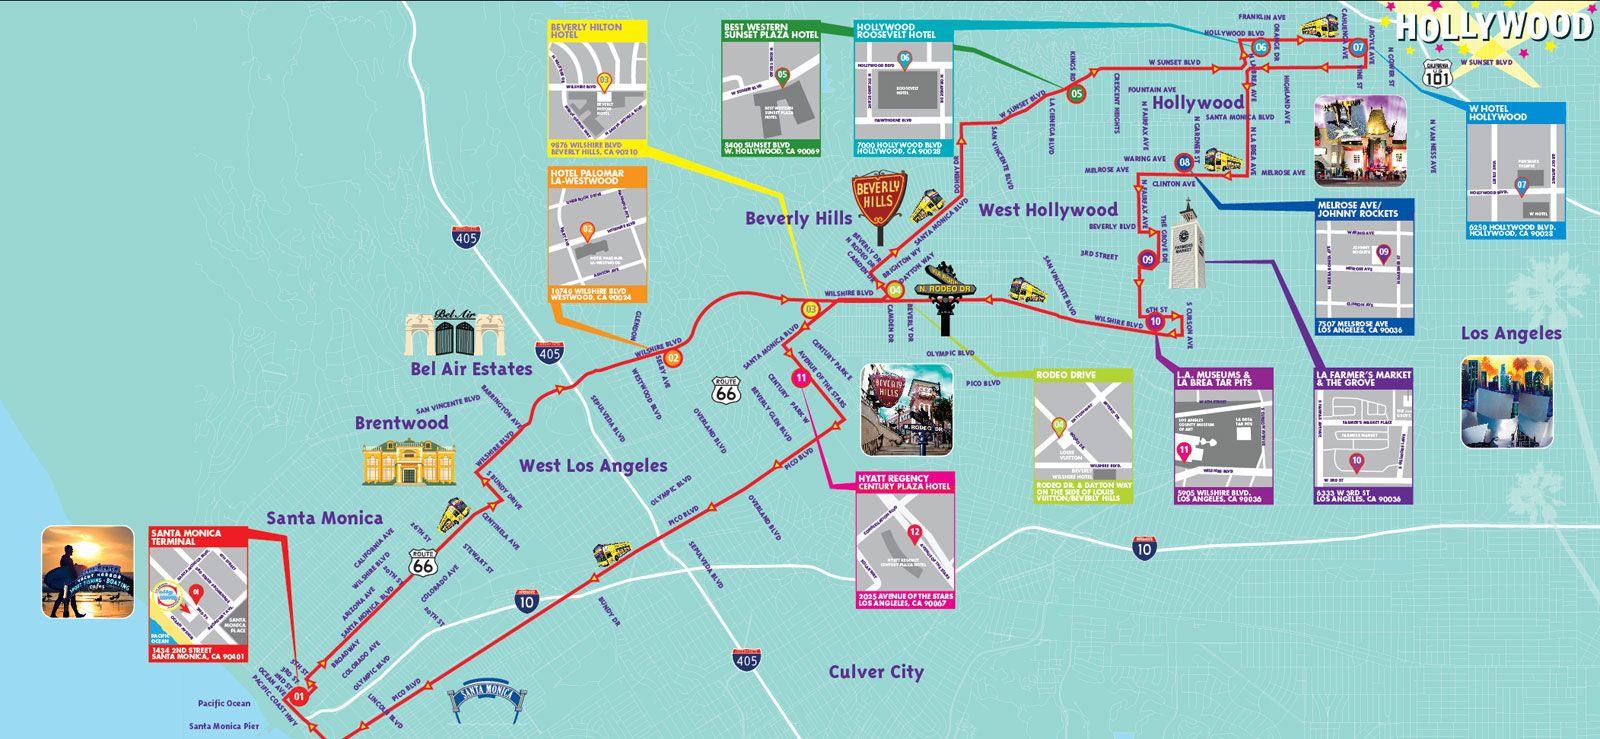 Los Angeles Tourist Guide Map Pesquisa Google Sfondi Sfondi Desktop Gatti Neri